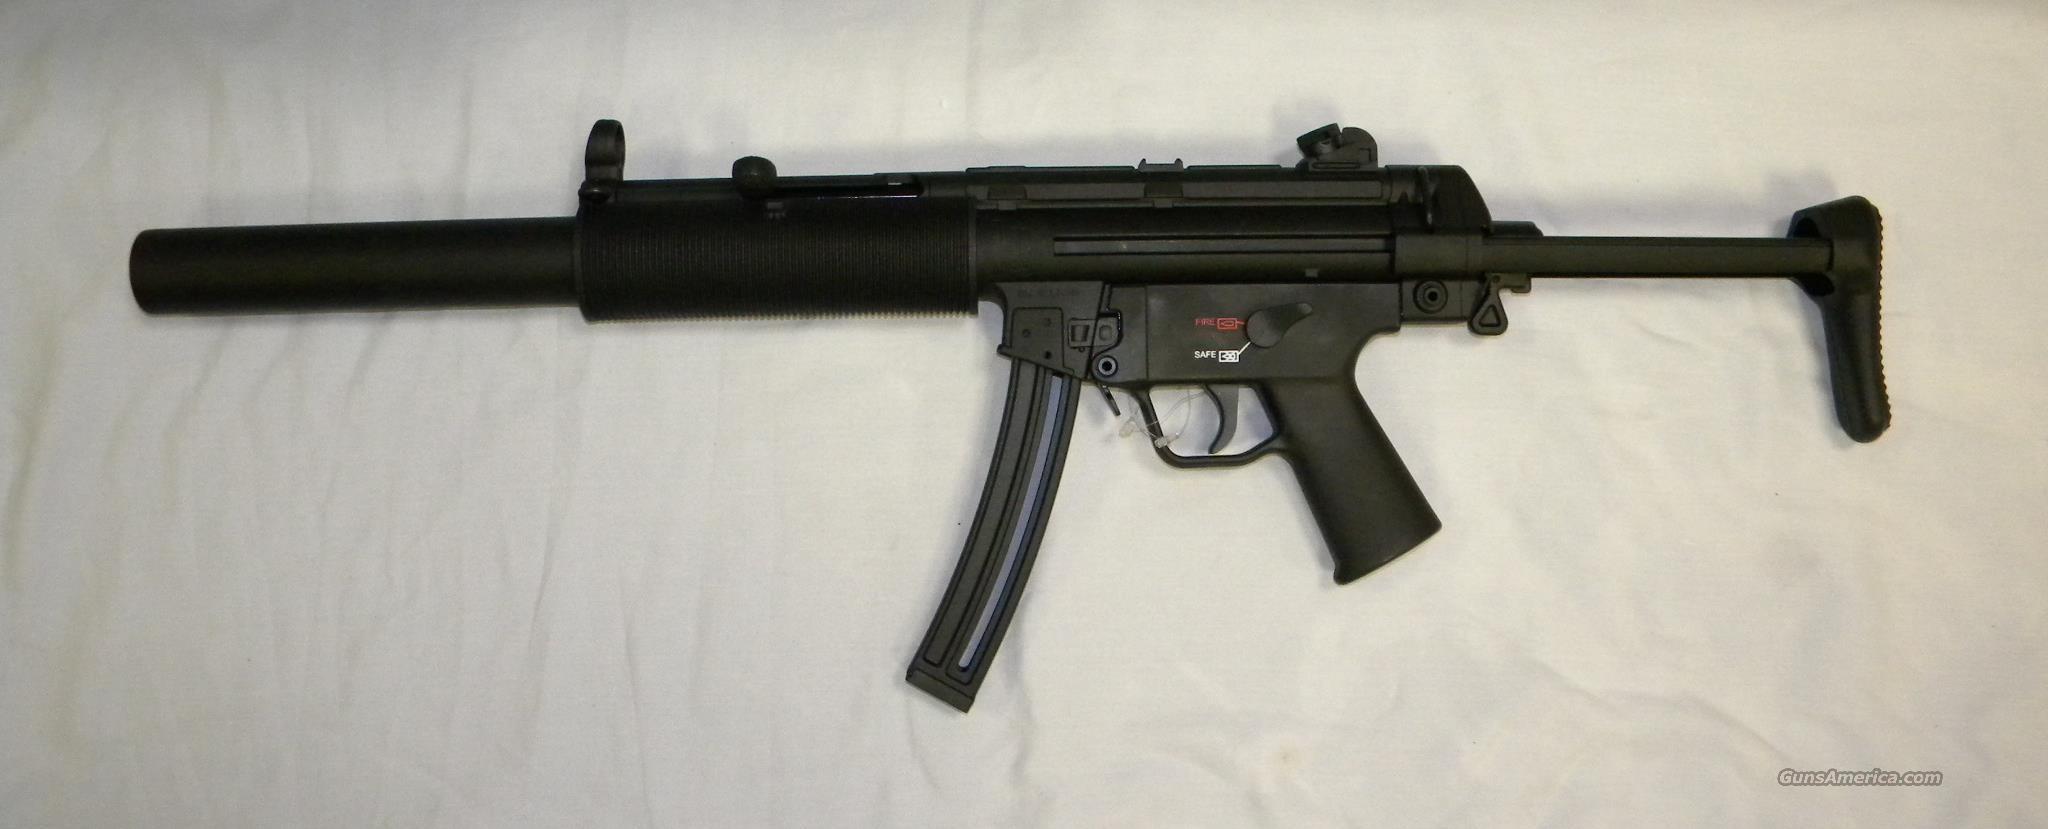 A1 Auto Sales >> HK MP5 SD, .22 LR for sale